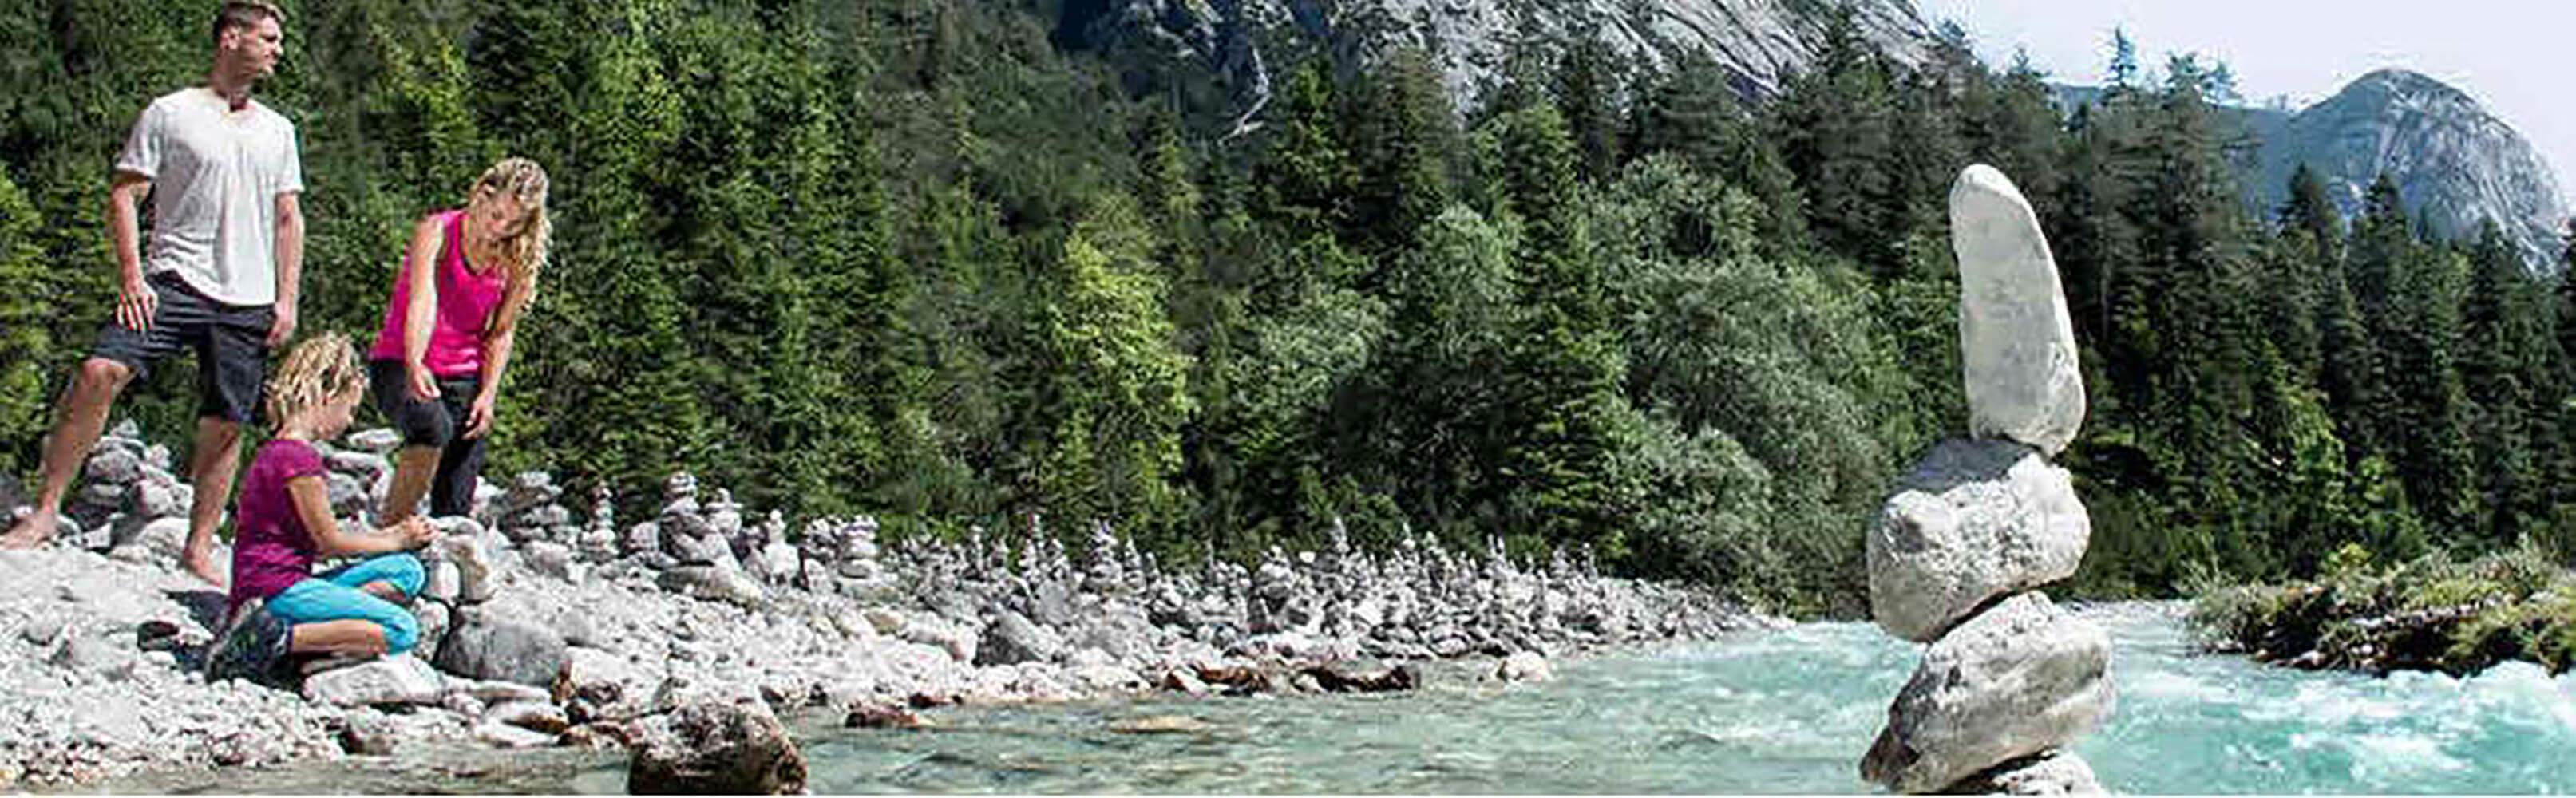 Olympiaregion Seefeld in Tirol 1